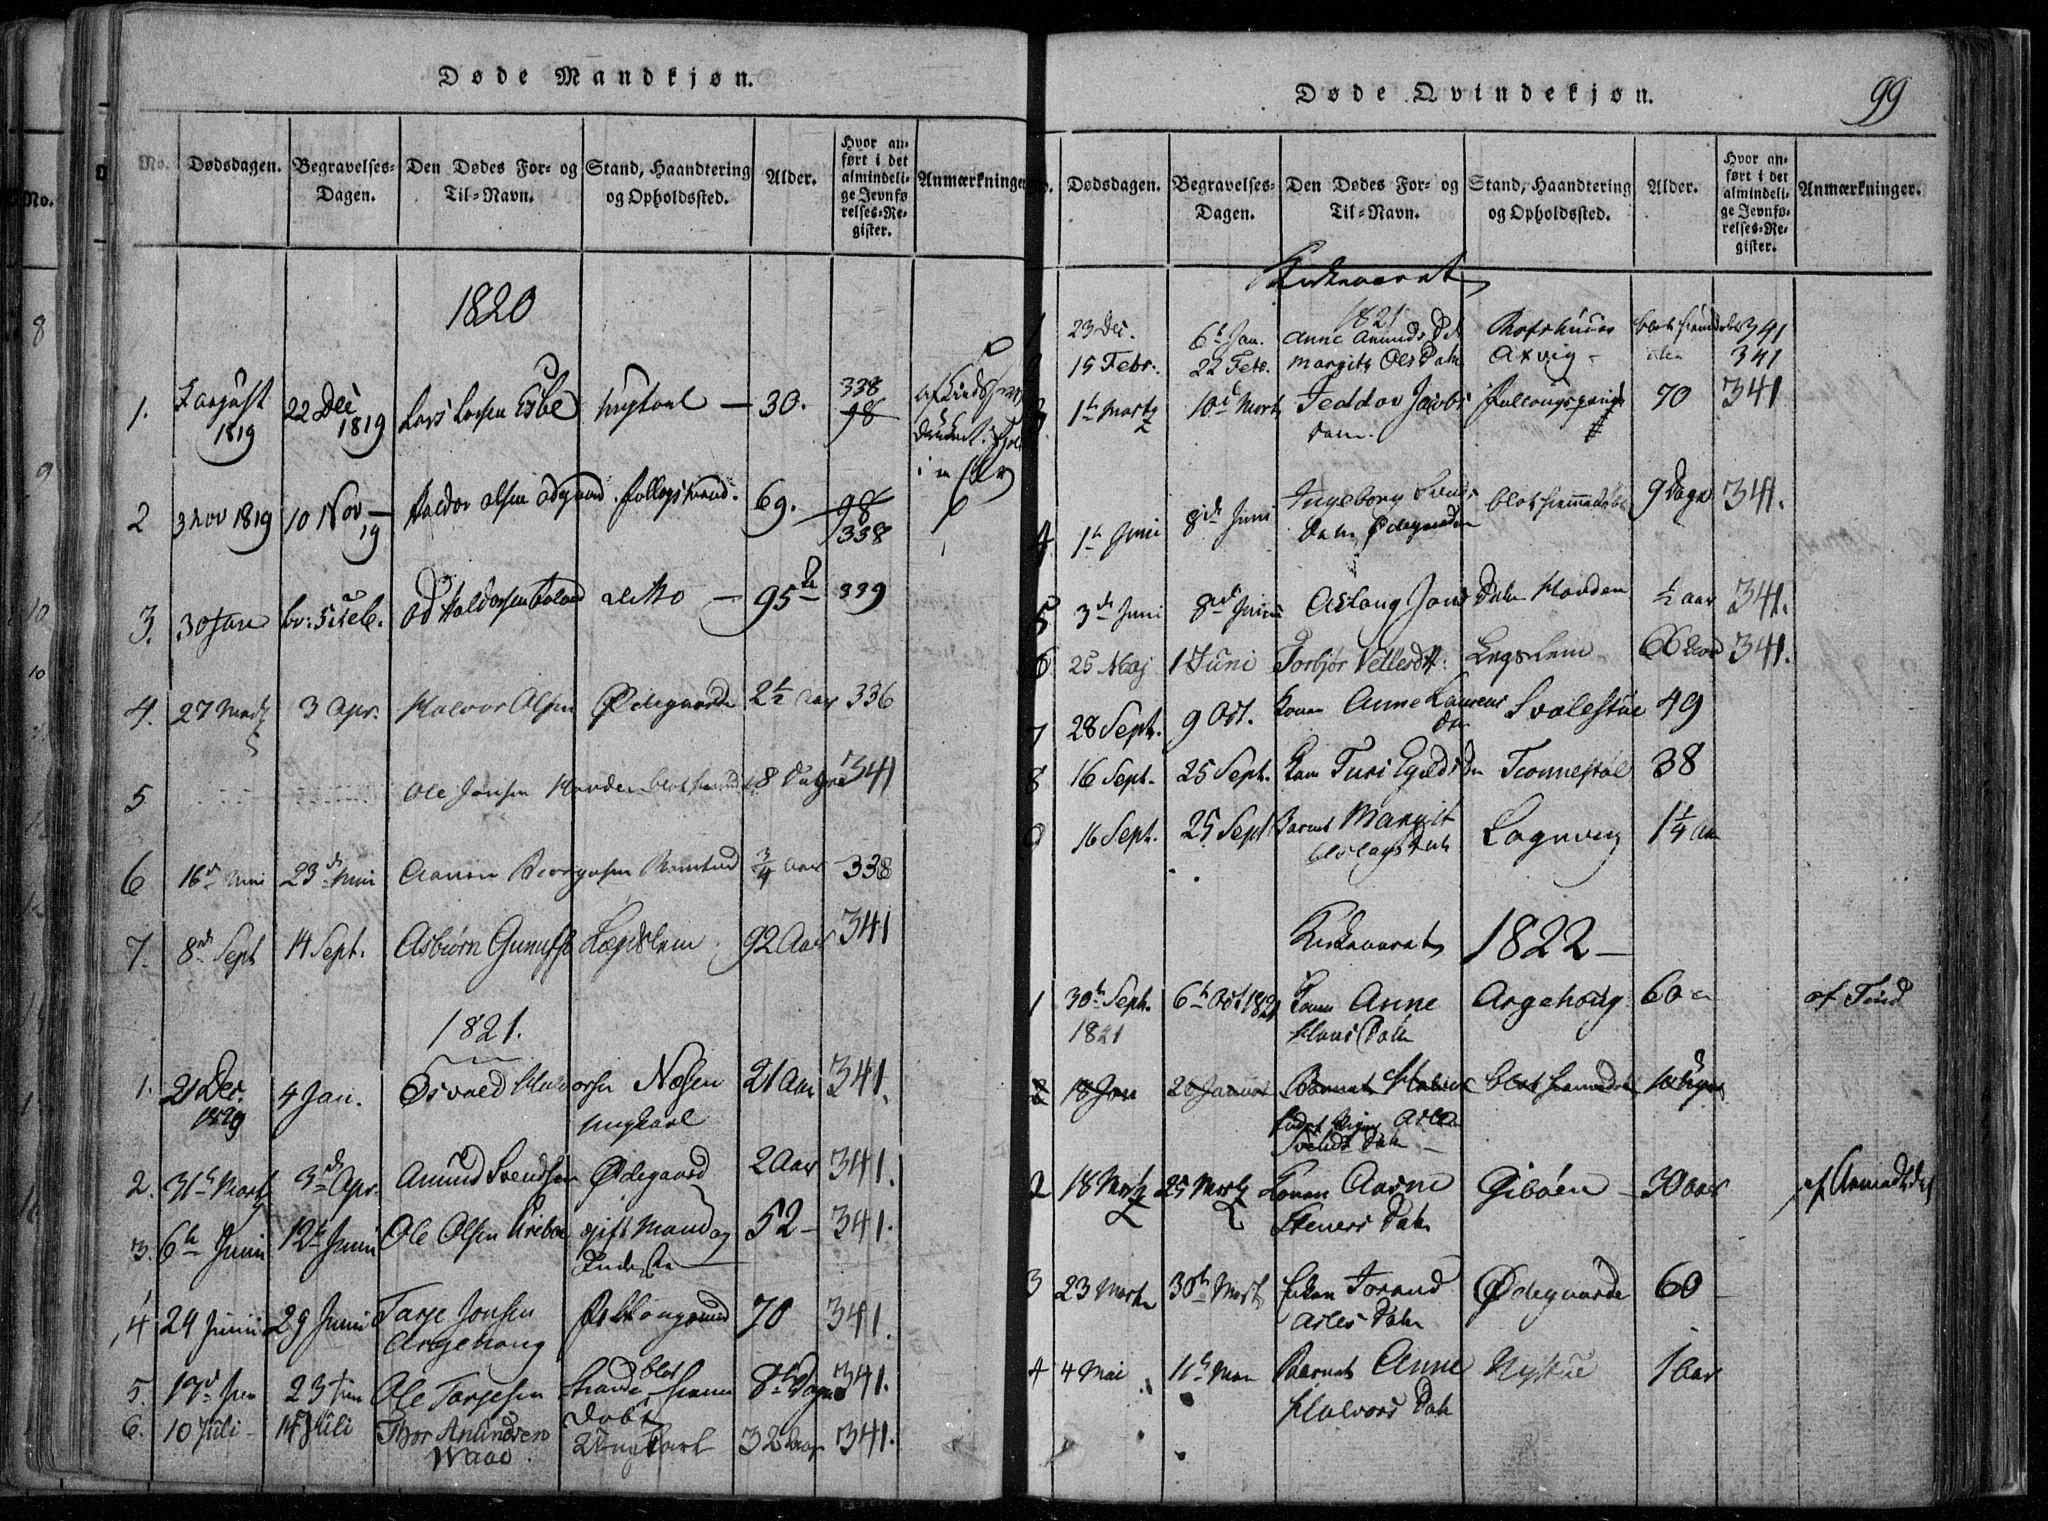 SAKO, Rauland kirkebøker, F/Fa/L0001: Ministerialbok nr. 1, 1814-1859, s. 99